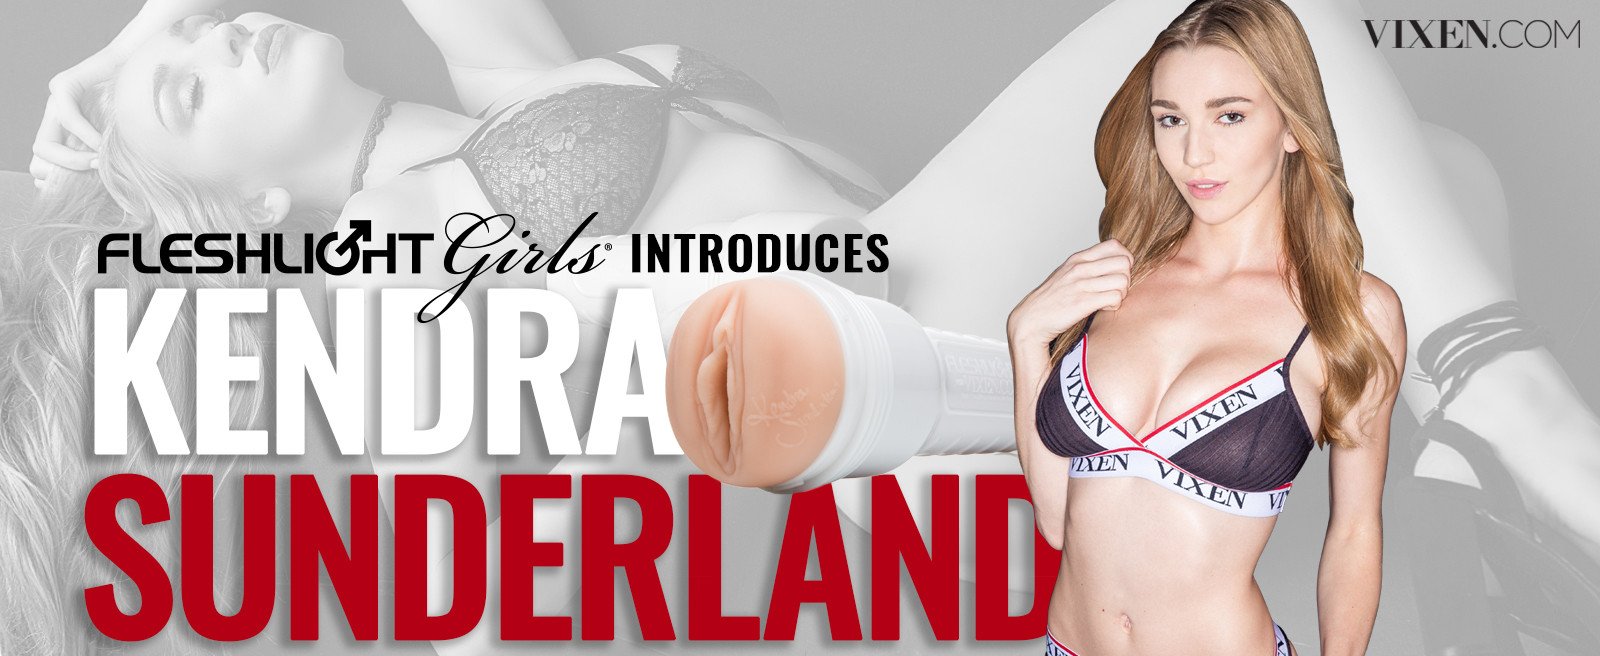 Kendra Sunderland is Fleshlights Newest Girl Image